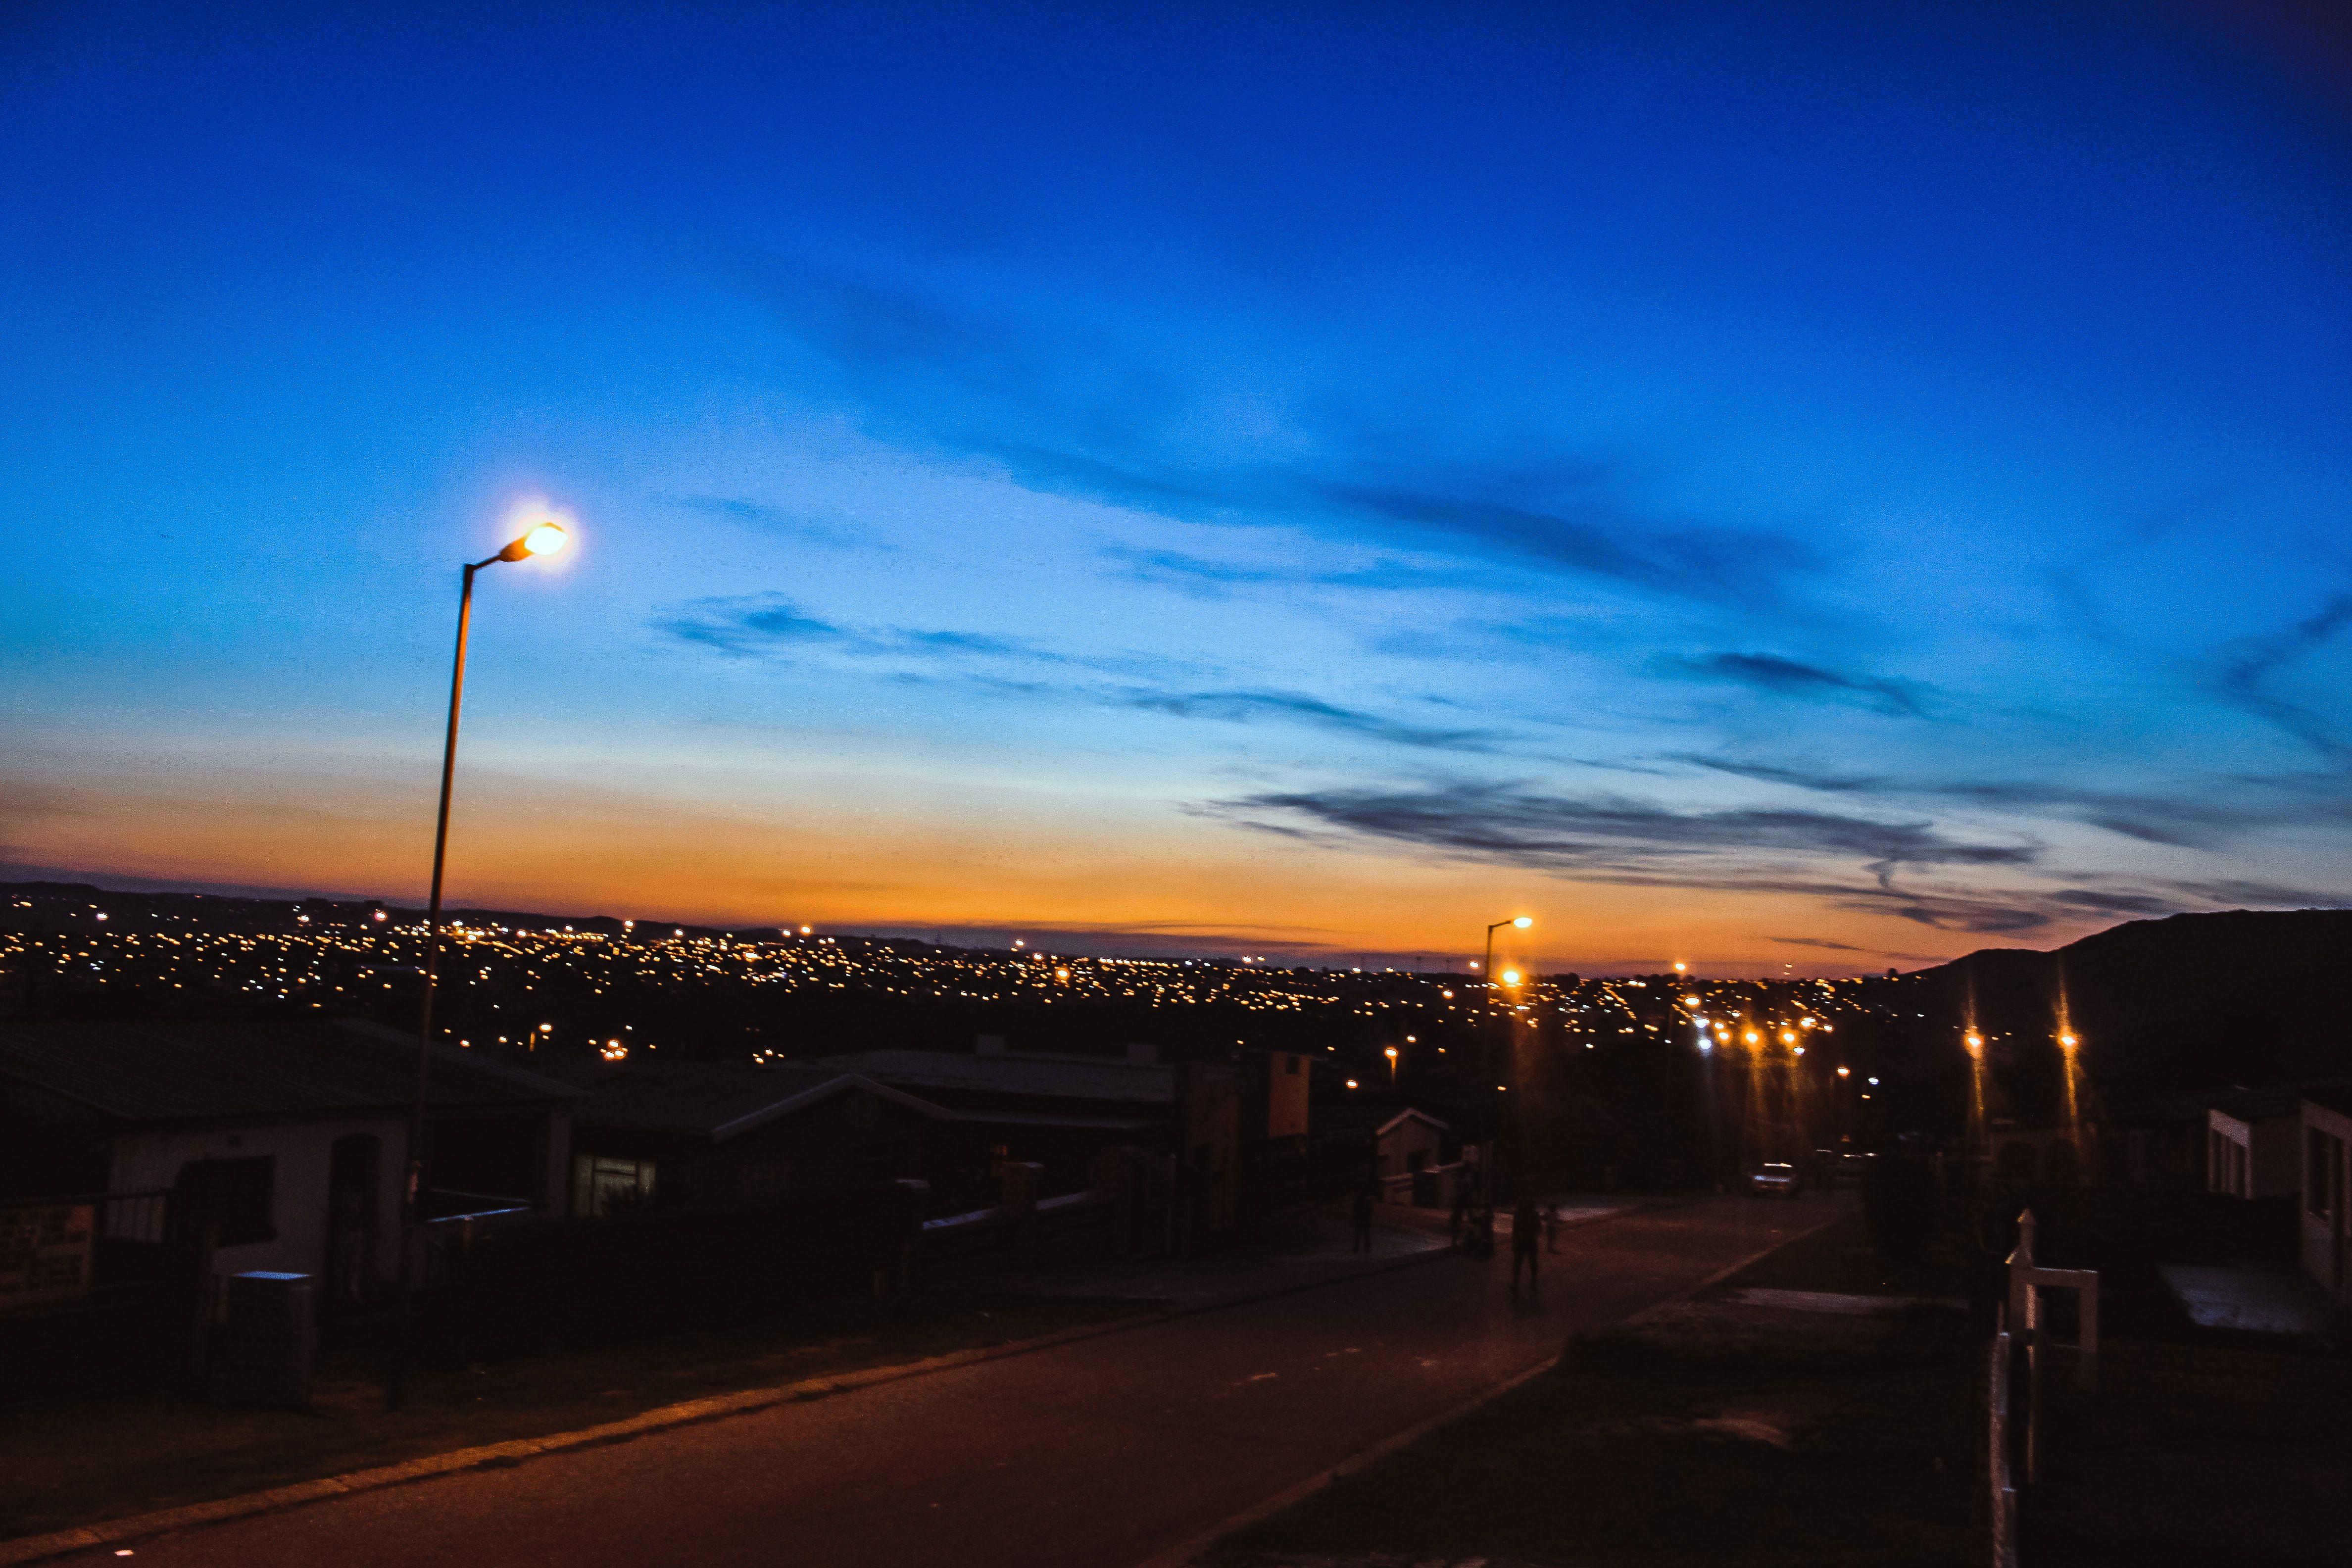 Nature Outdoors Sky Light Posts Turned On Light Posts Turned